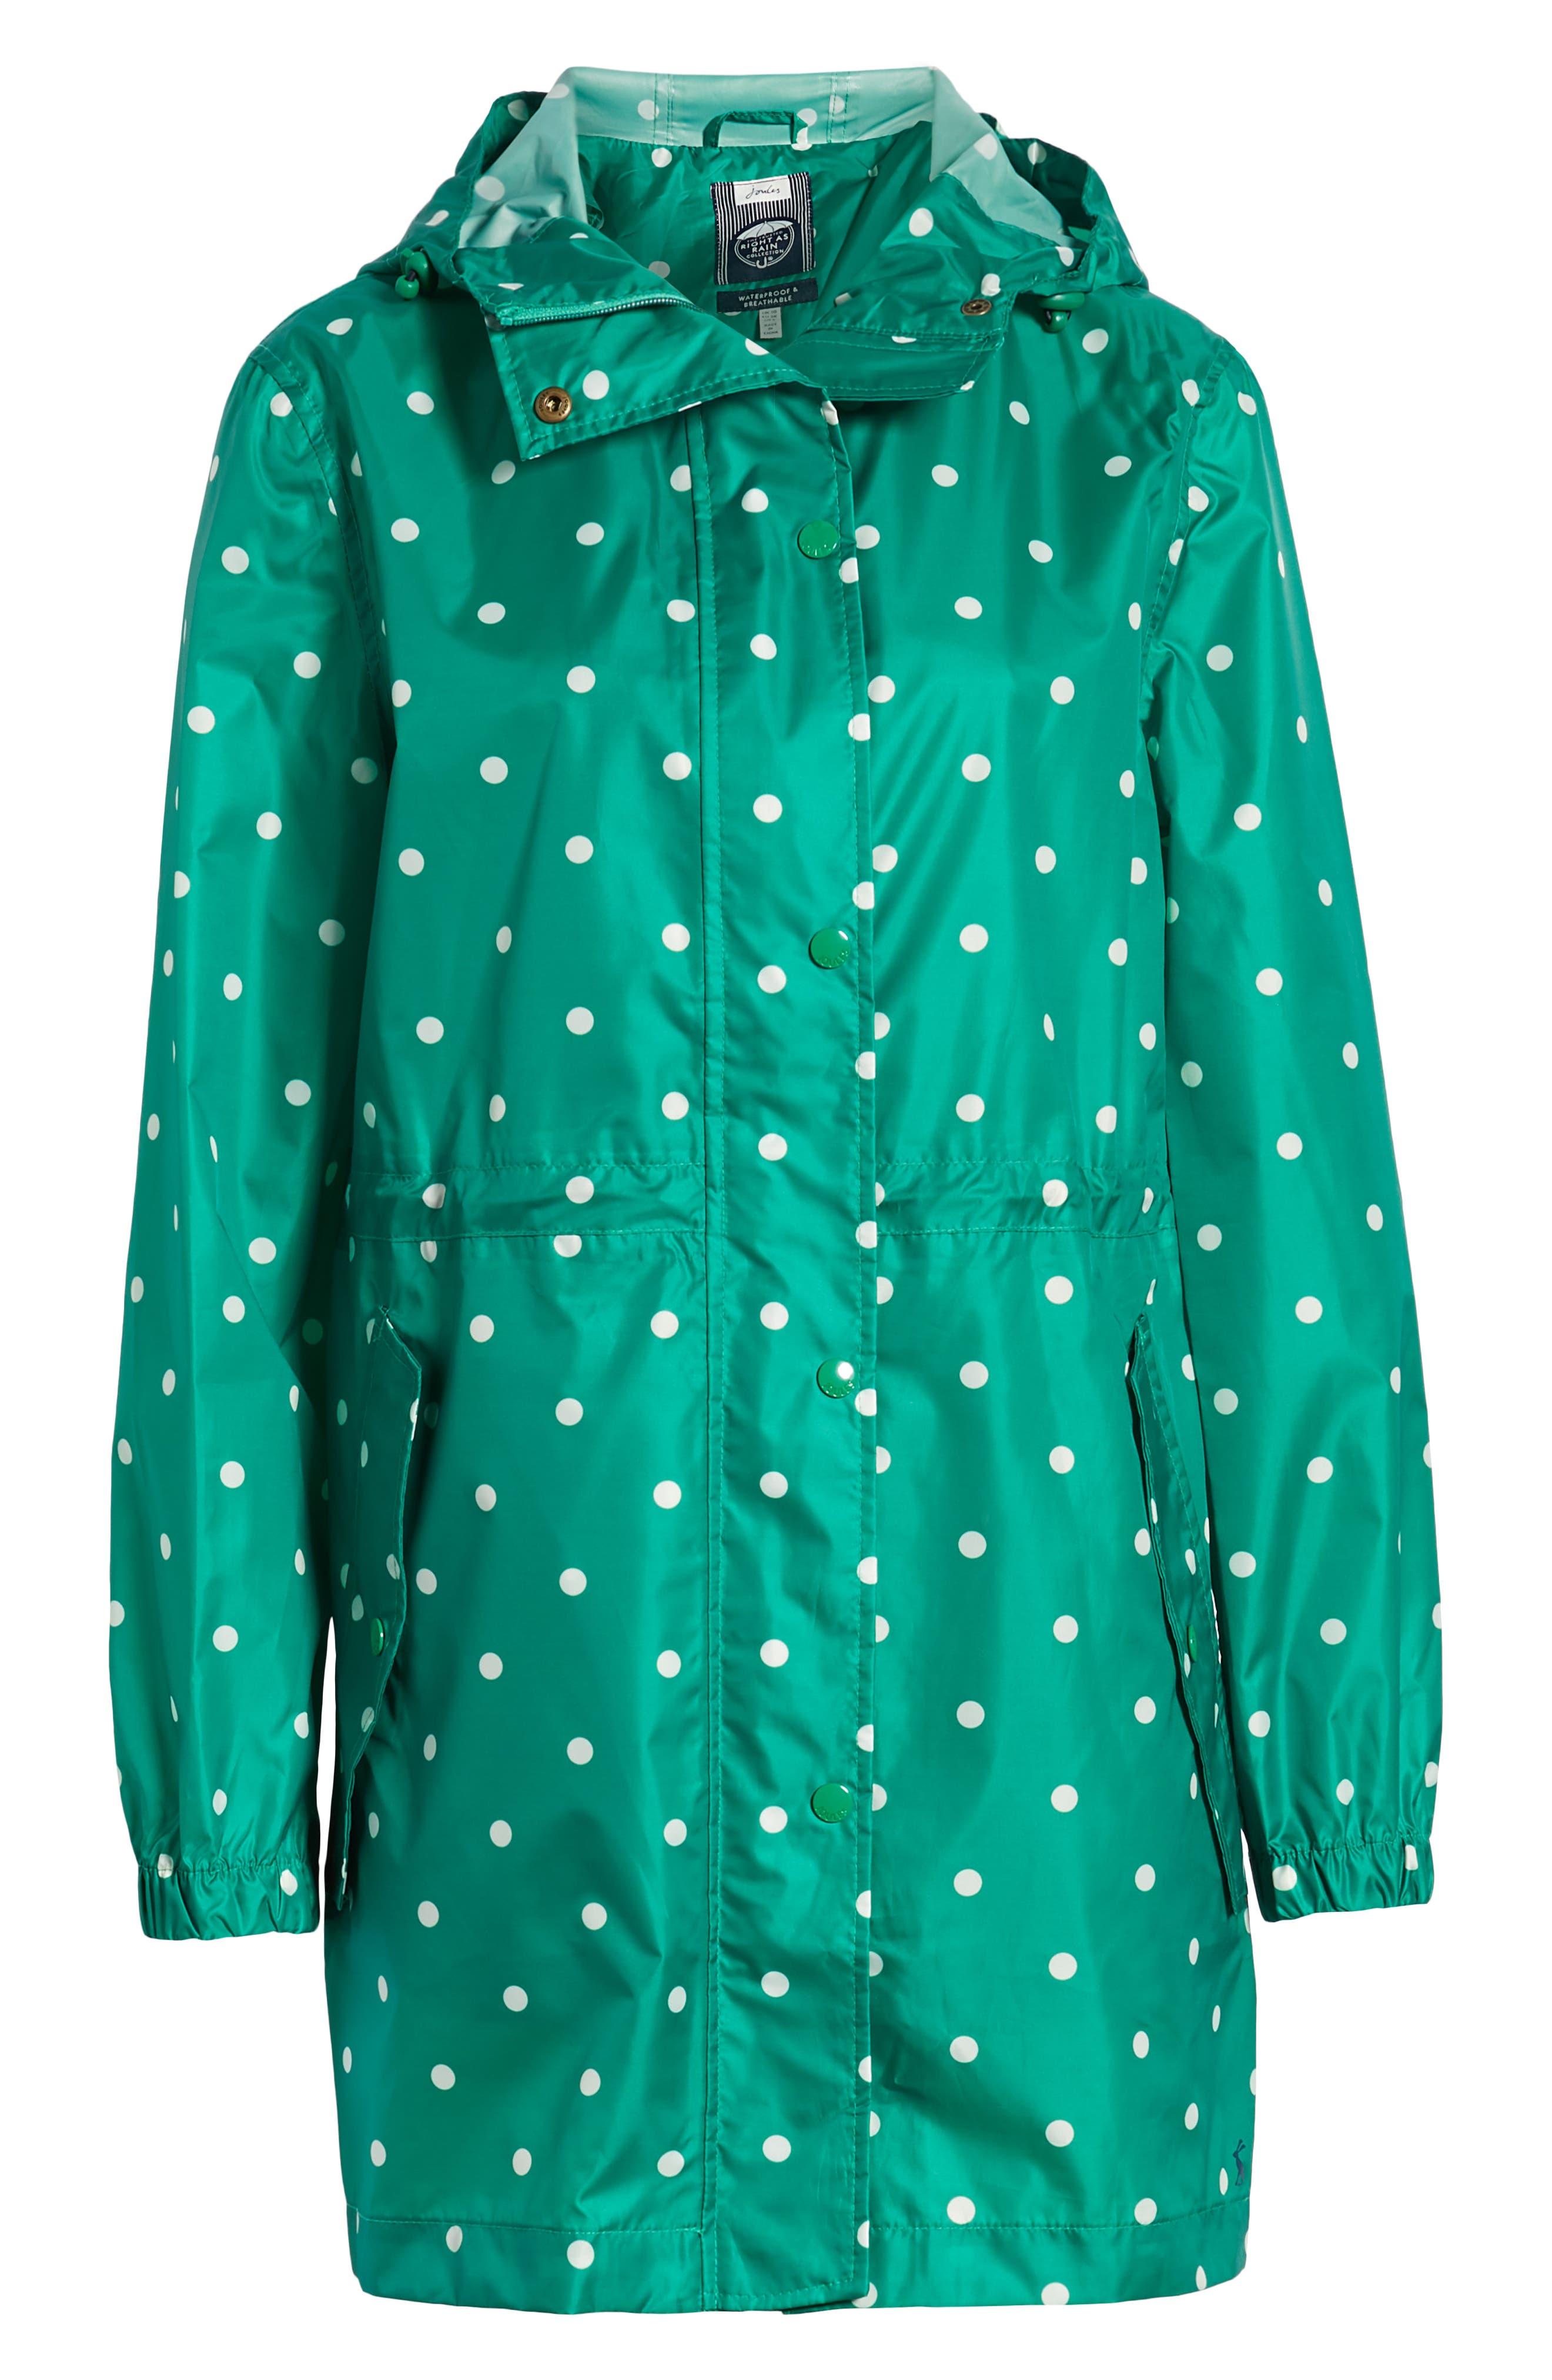 Go Lightly Waterproof Pack Away Hooded Jacket,                             Alternate thumbnail 6, color,                             GREEN SPOT